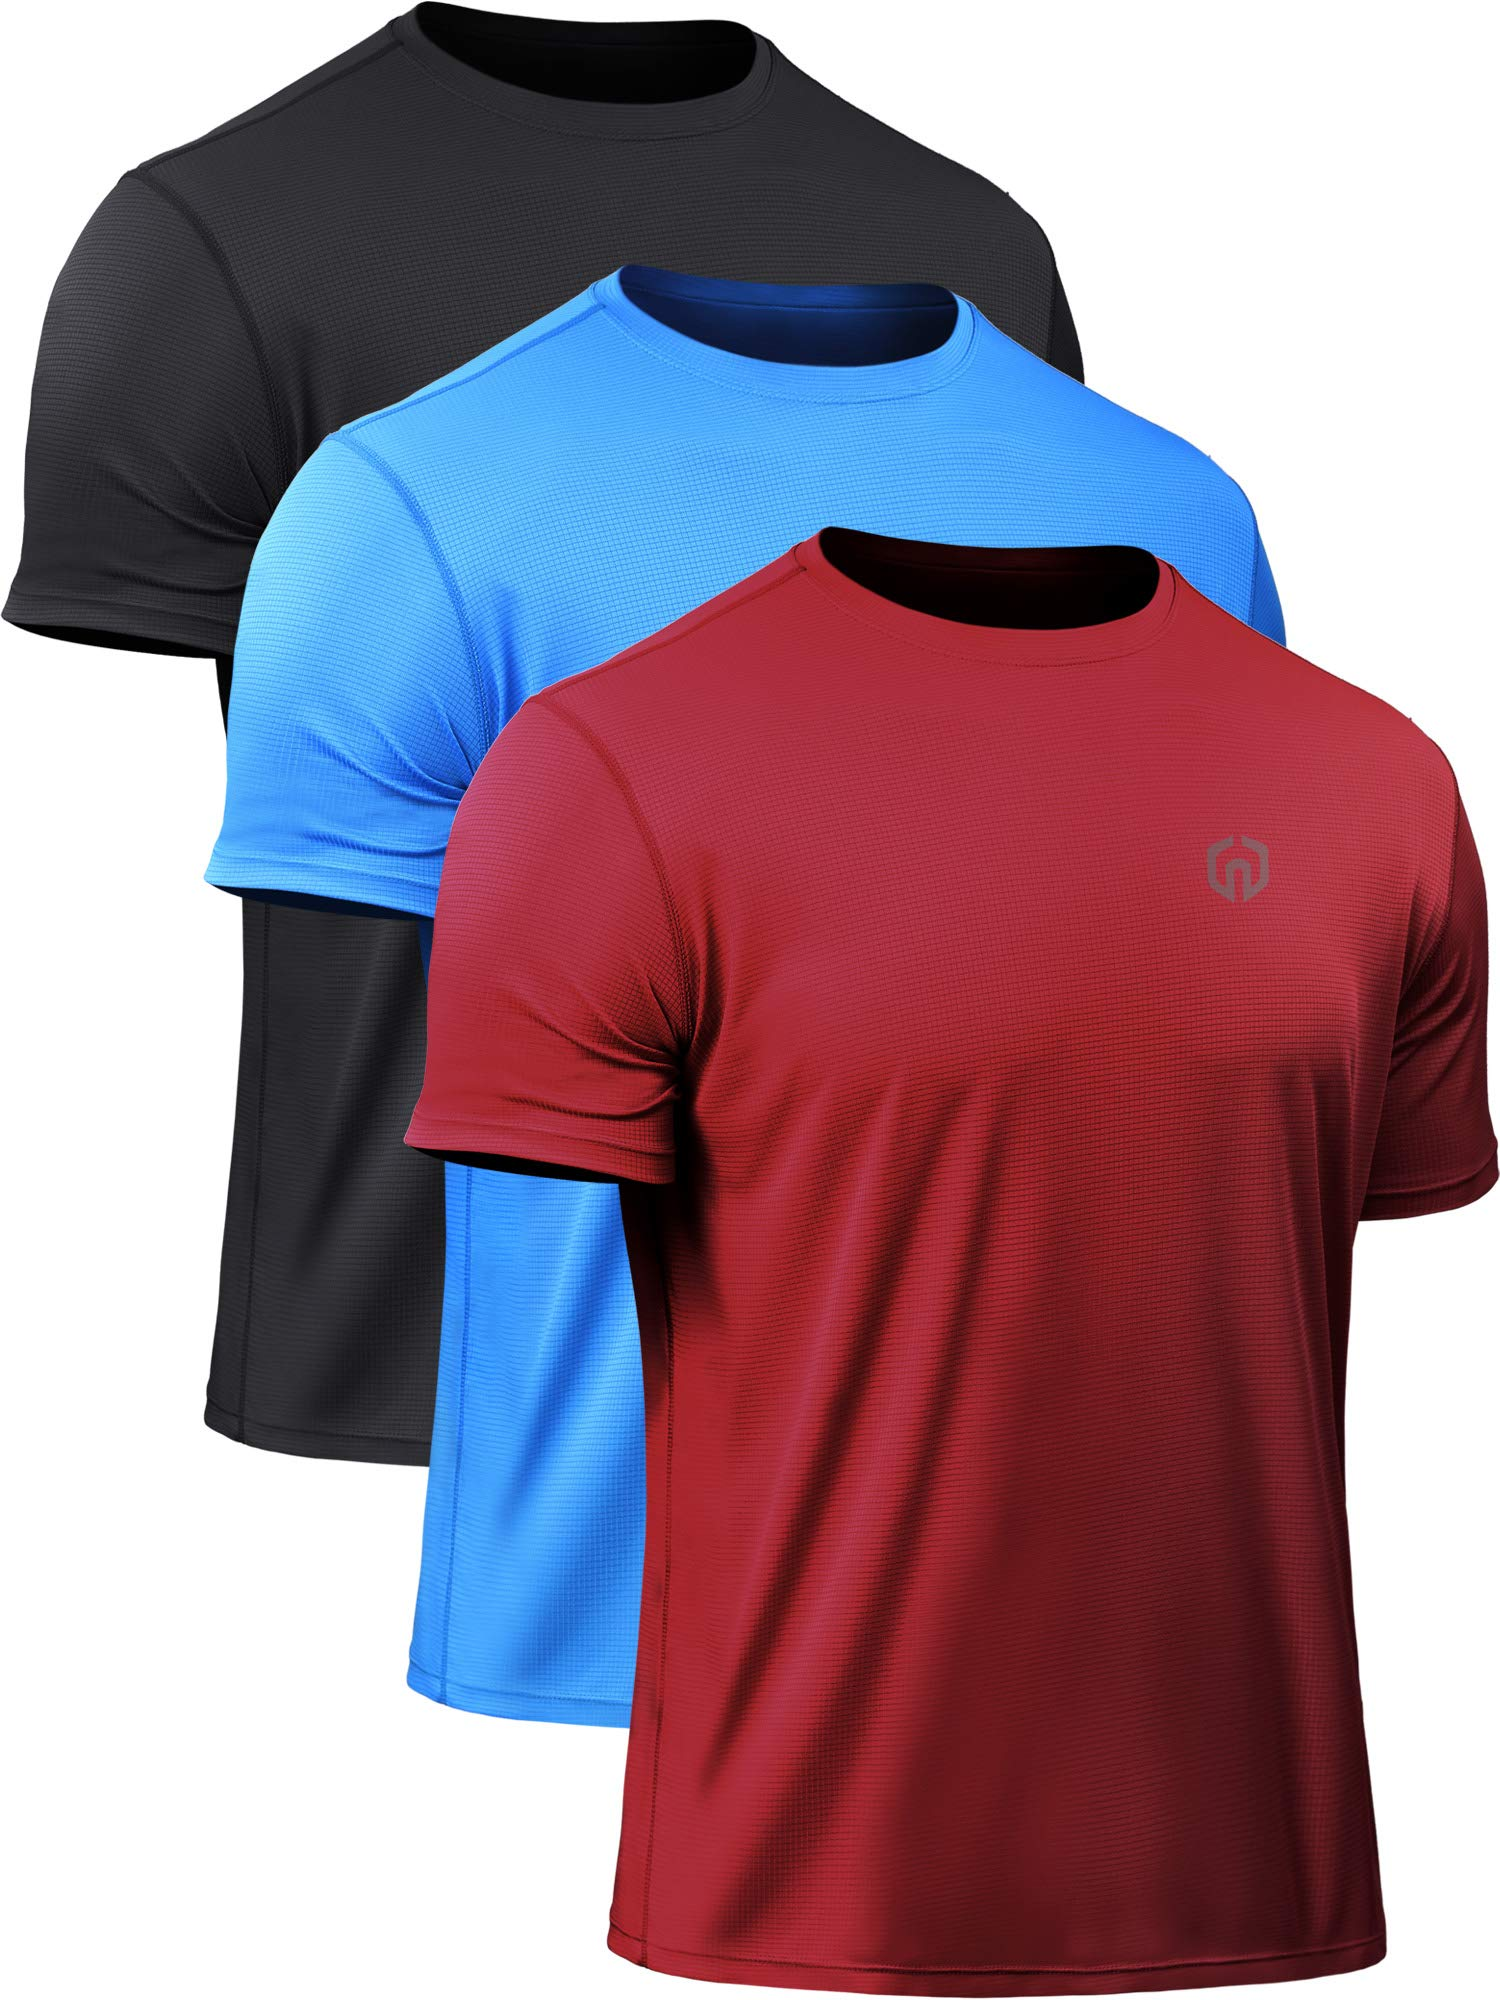 Neleus Mens Dry Fit Athletic Performance Shirt